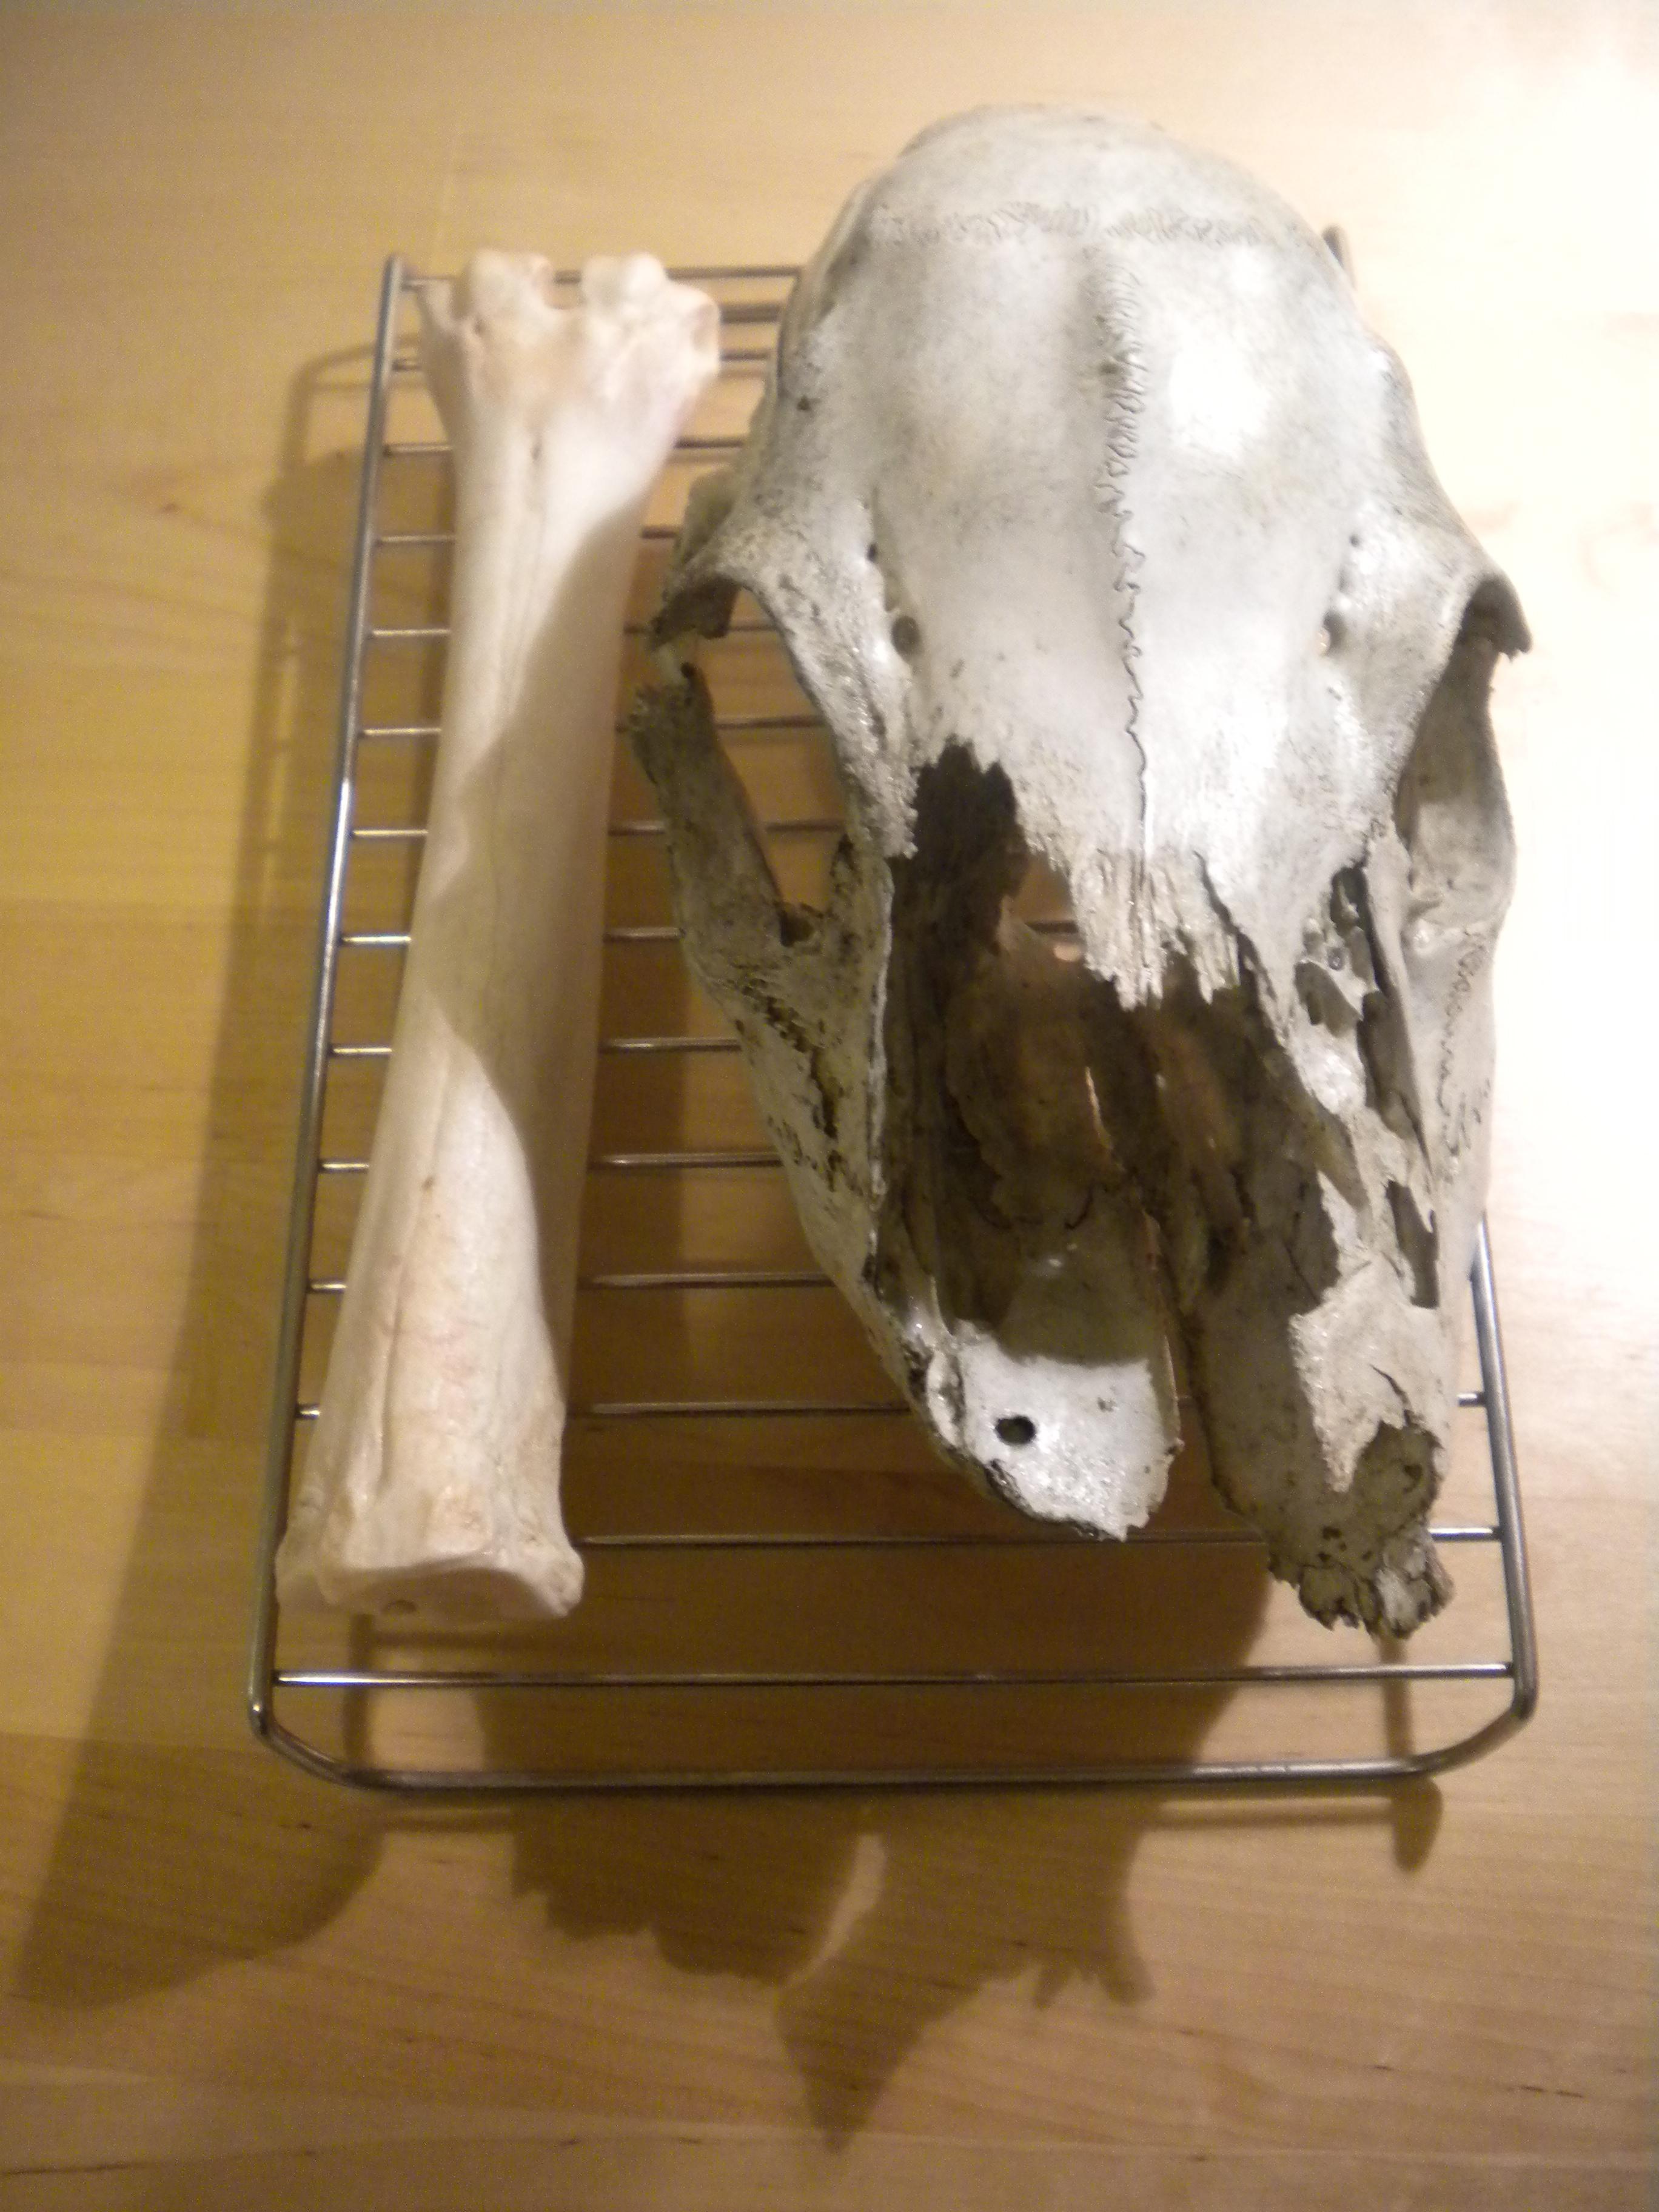 Prepping Animal Skeletons | Bone Broke